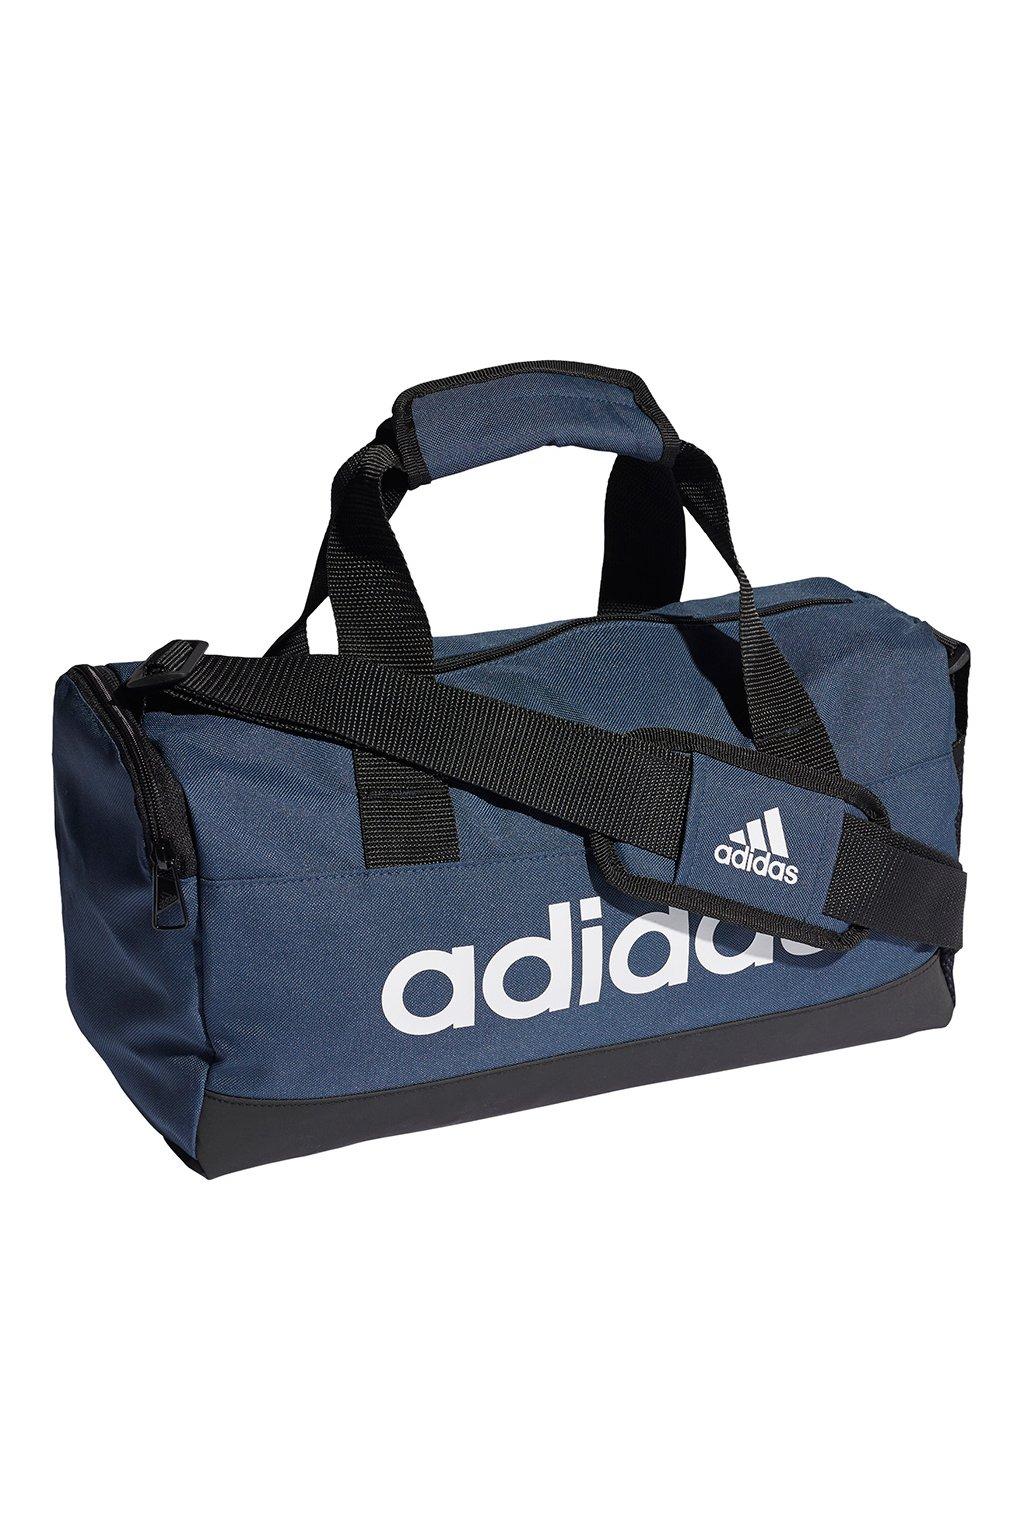 Taška adidas Essentials Logo Duffel Bag XS tmavomodrá GV0951